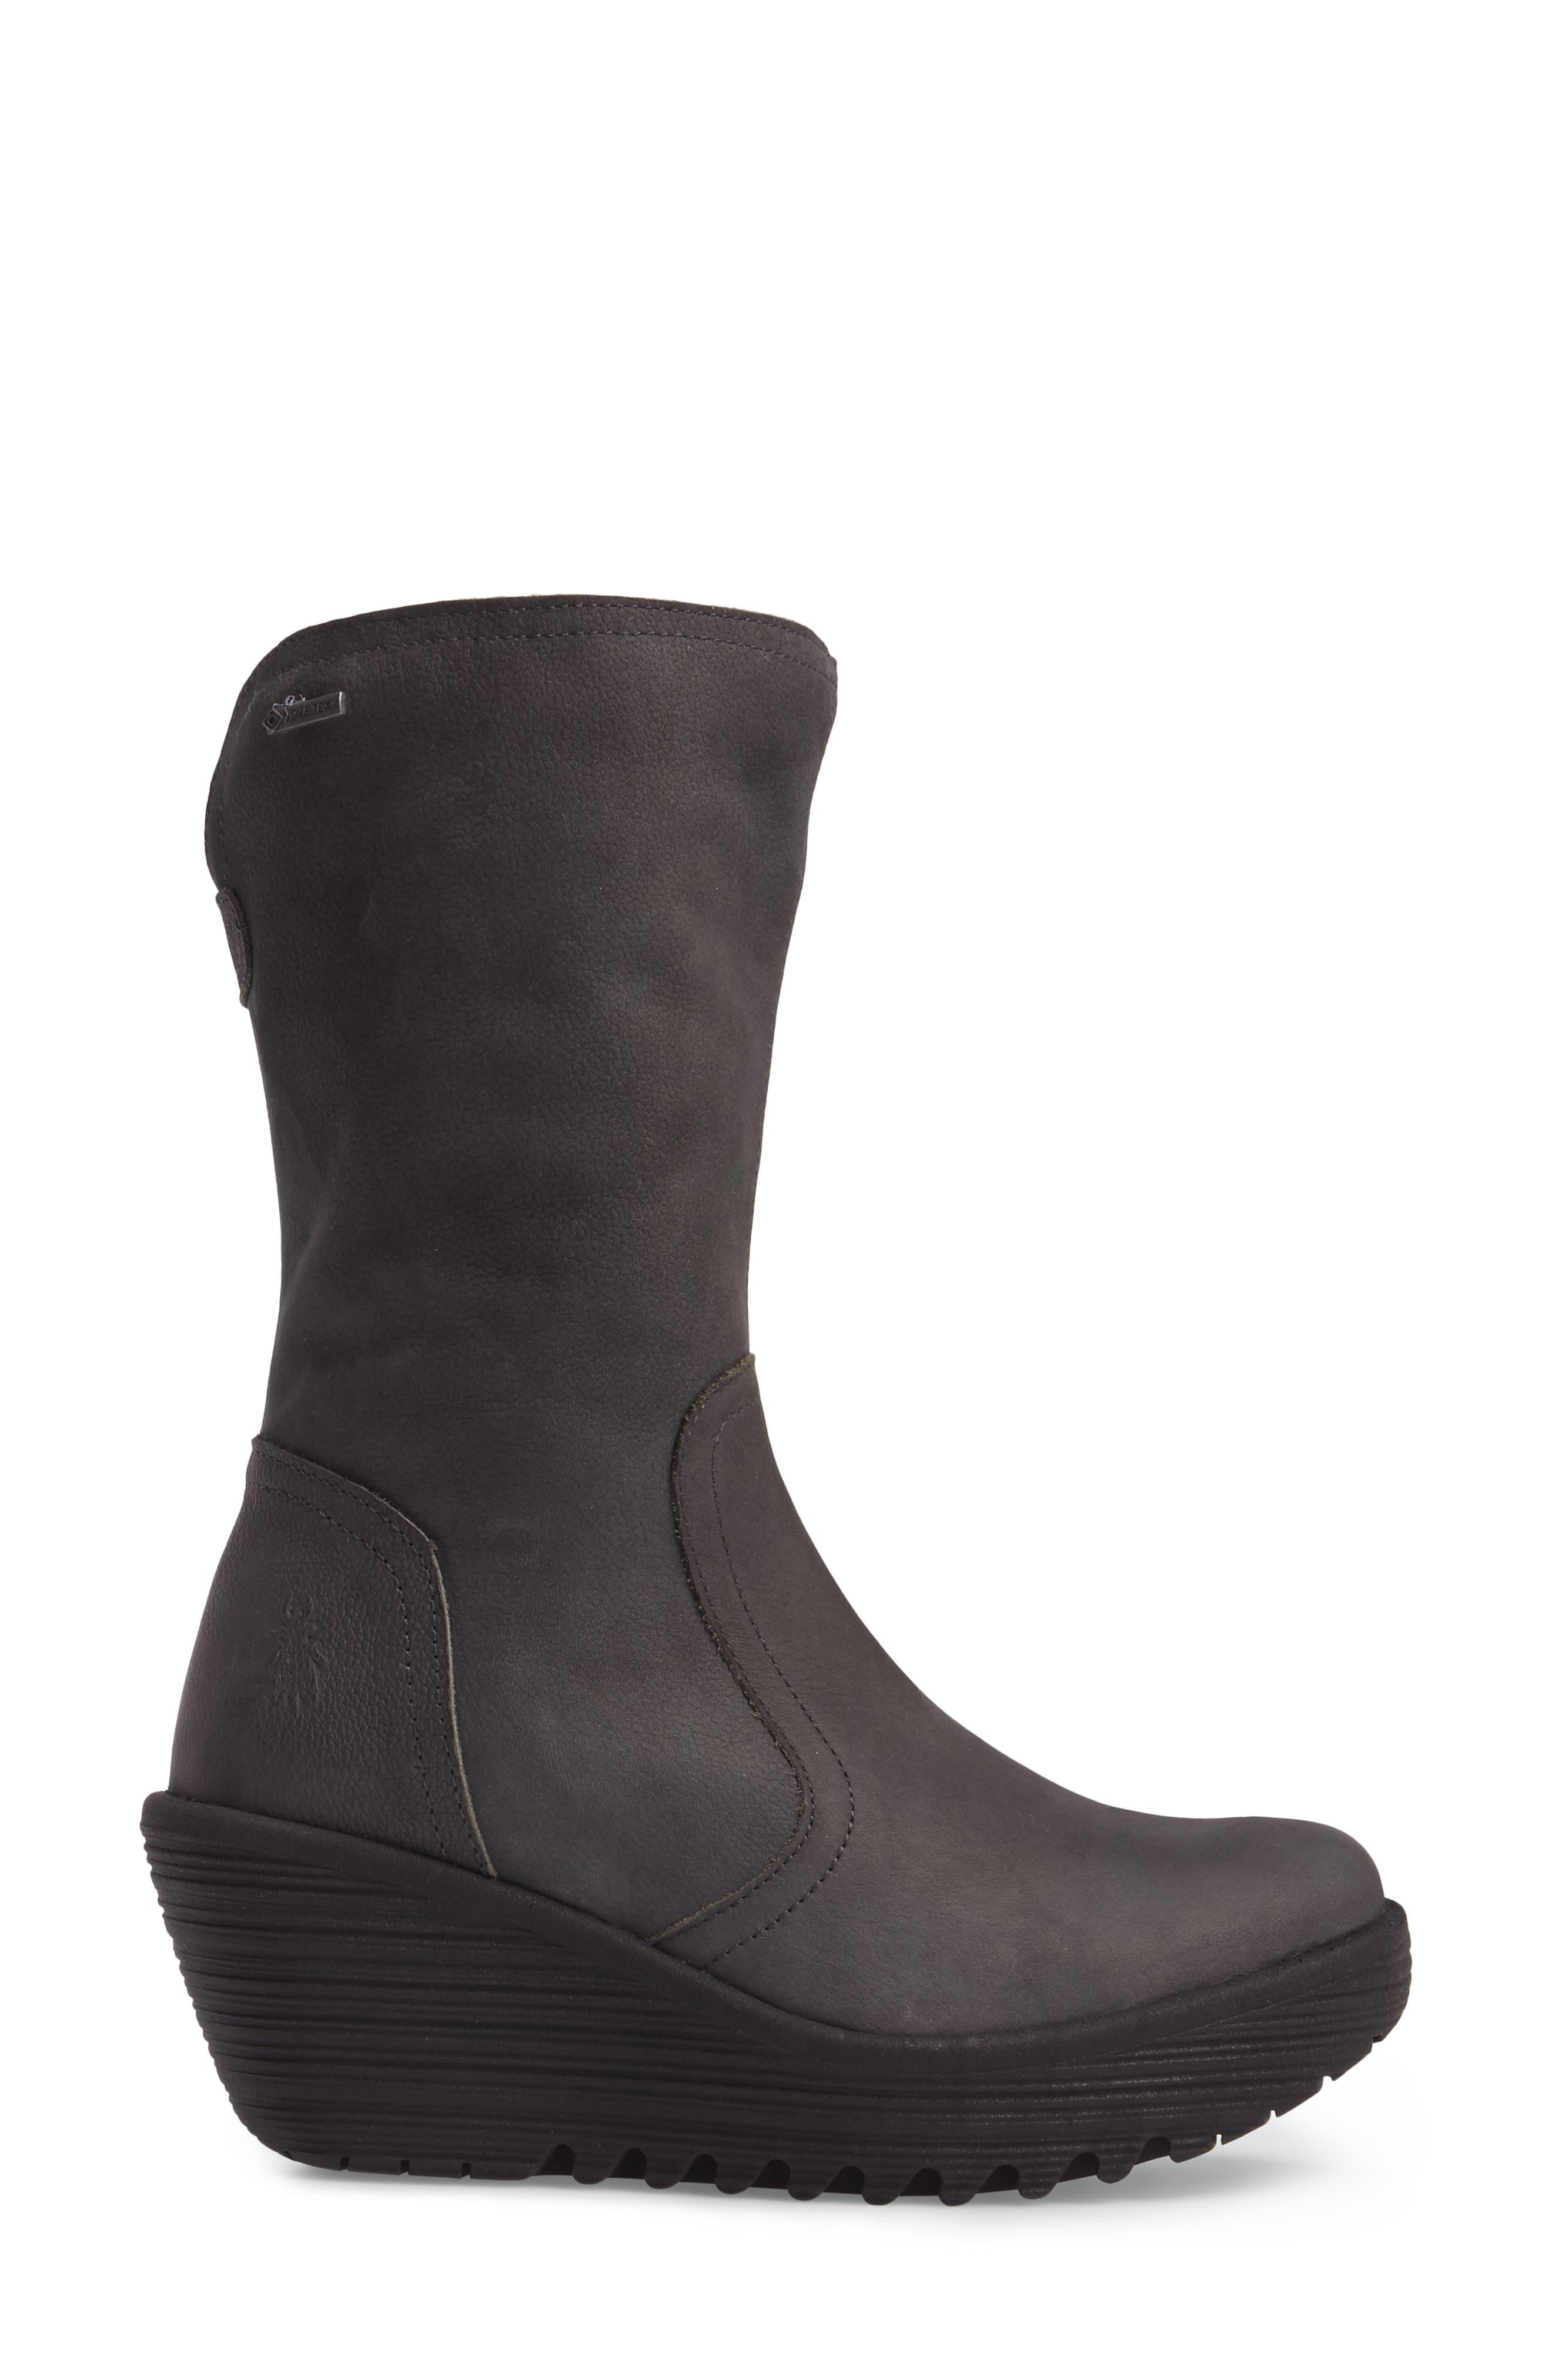 Alternate Image 3  - Fly London Yups Waterproof Gore-Tex® Wedge Boot (Women)